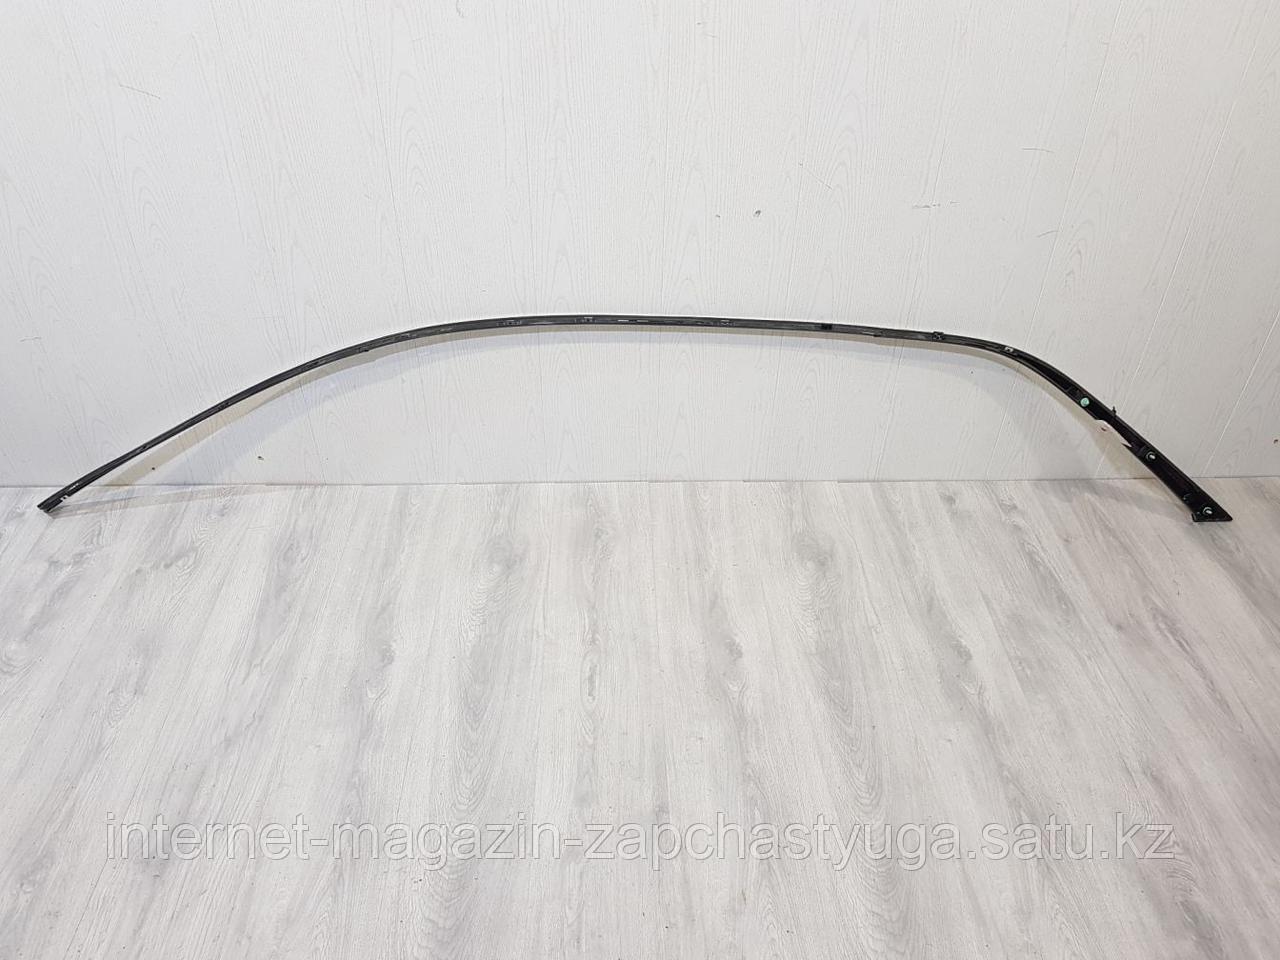 22744644 Молдинг кузова правый для Cadillac CTS 2013- Б/У - фото 3